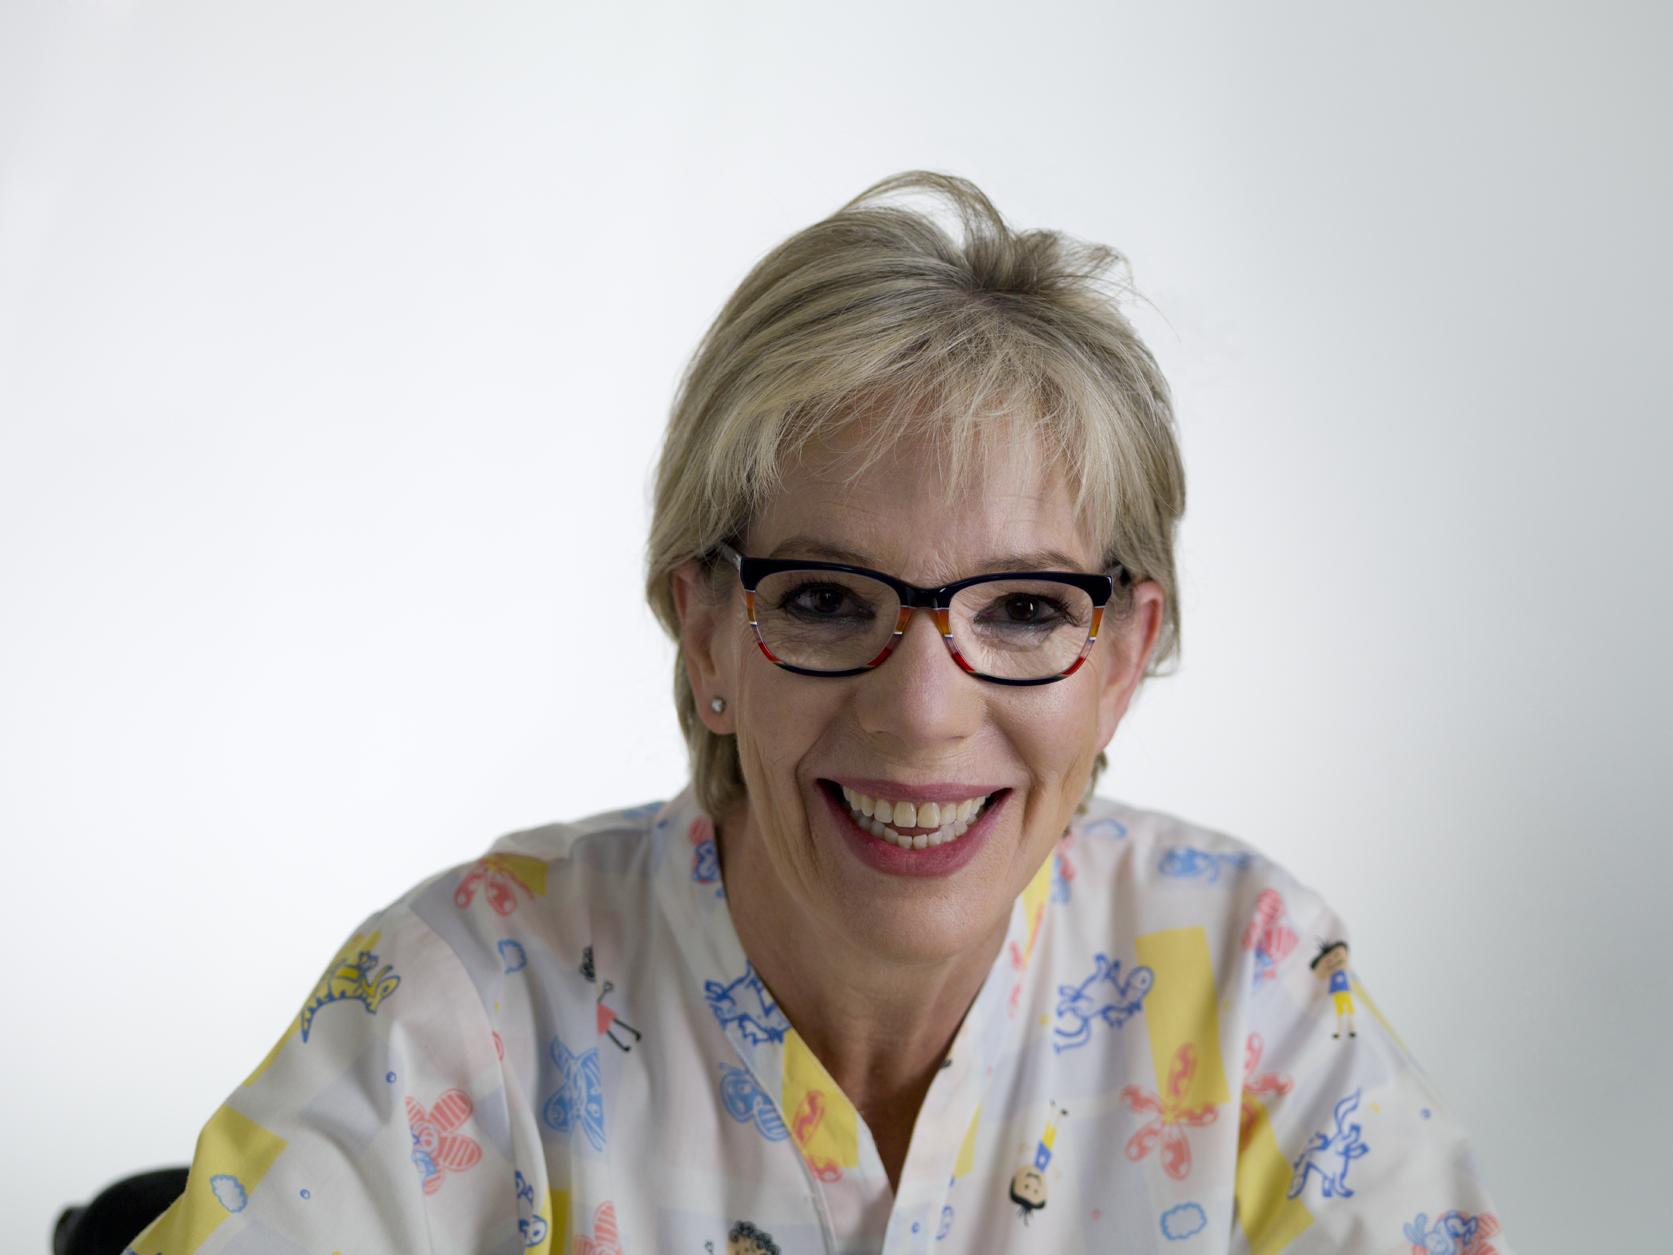 Doctora Celia López de las Huertas